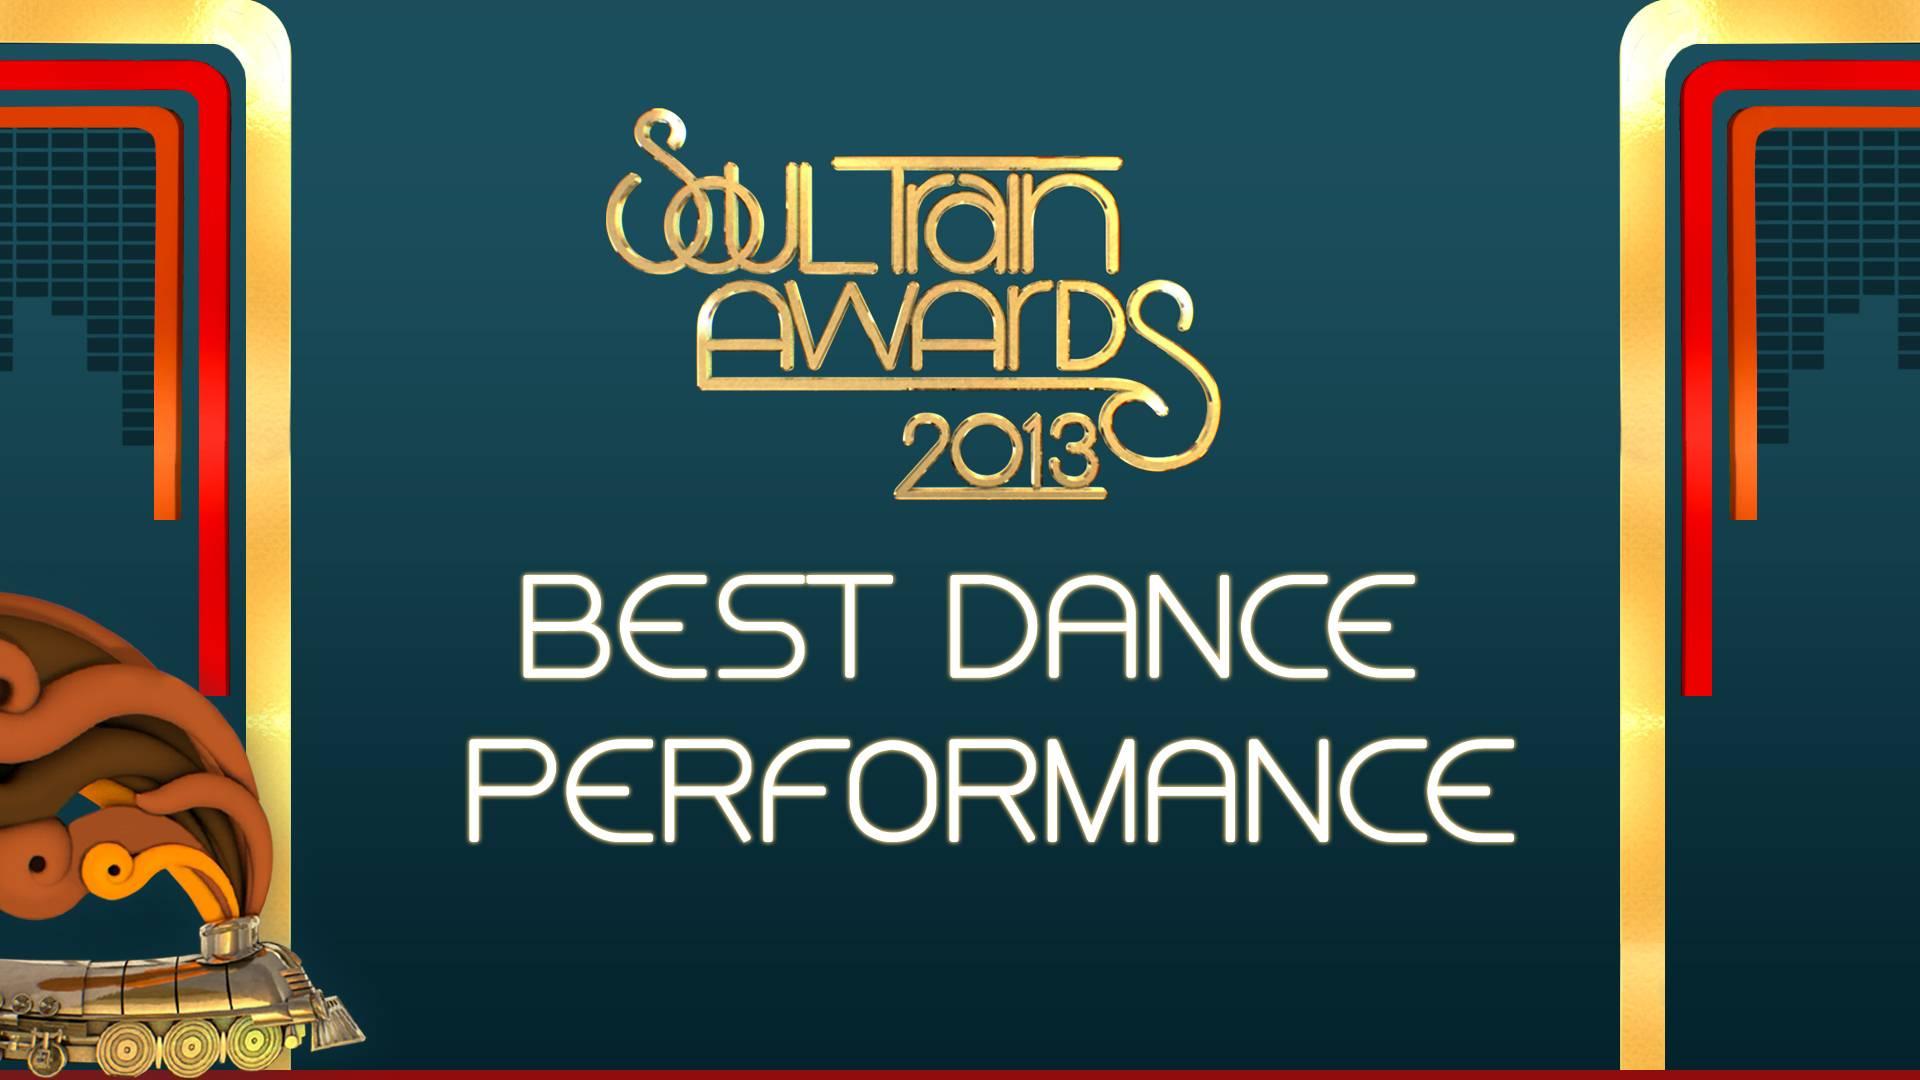 Best Dance Performance